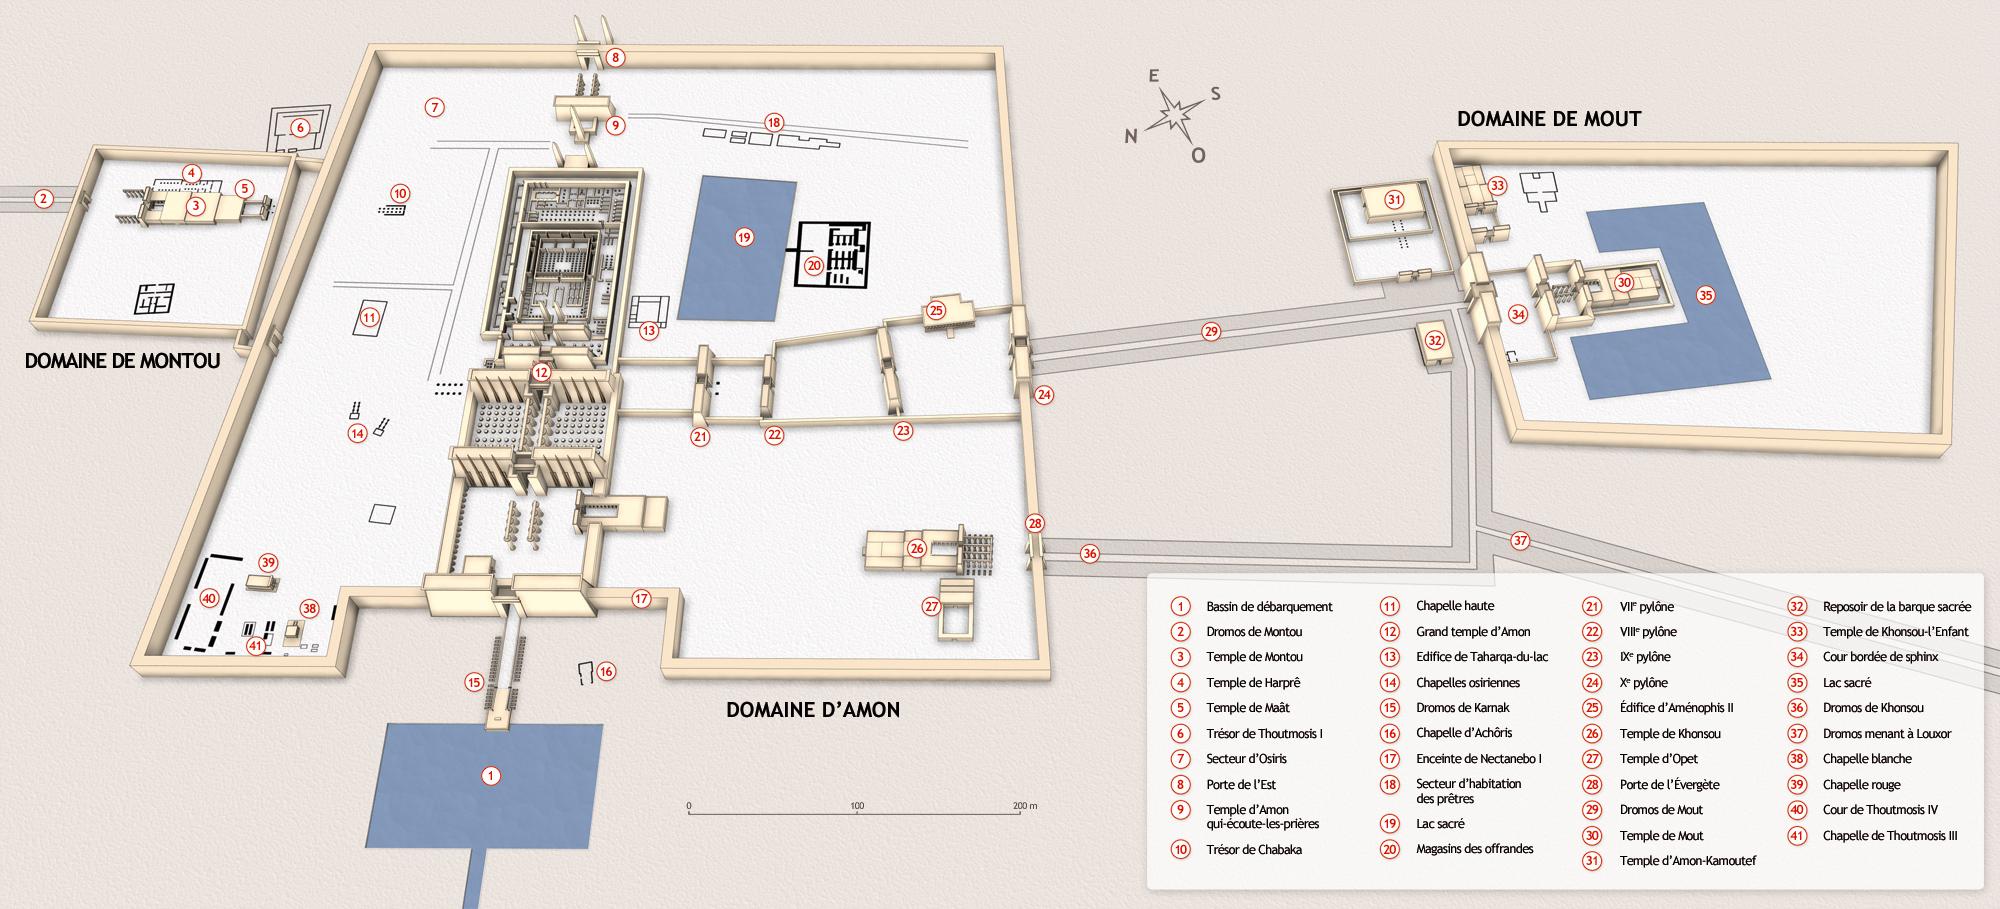 Plan du complexe funéraire de Karnak